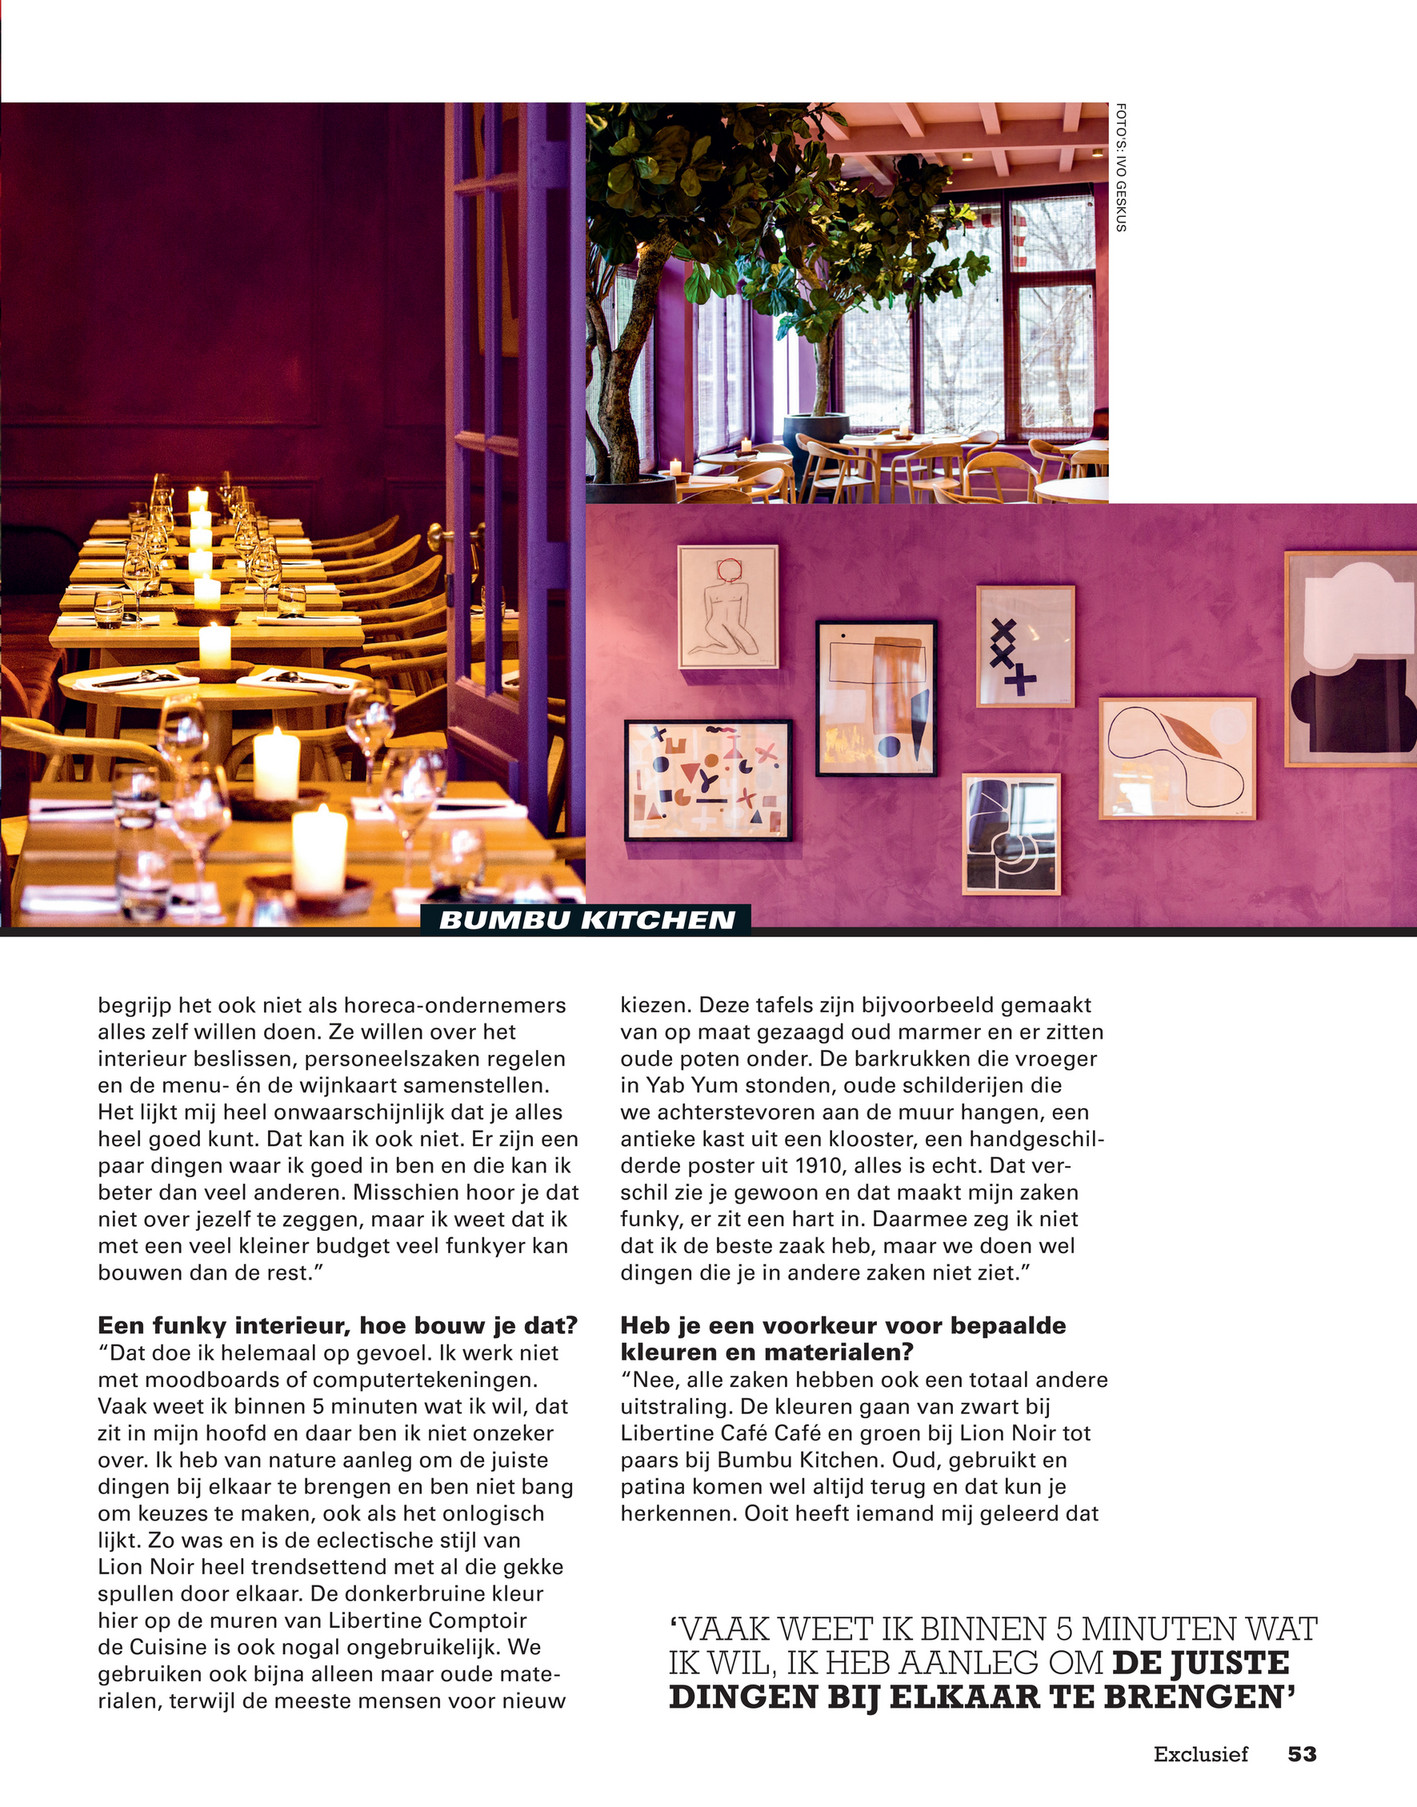 Sligro Exclusief Magazine 03 2018 Pagina 54 55